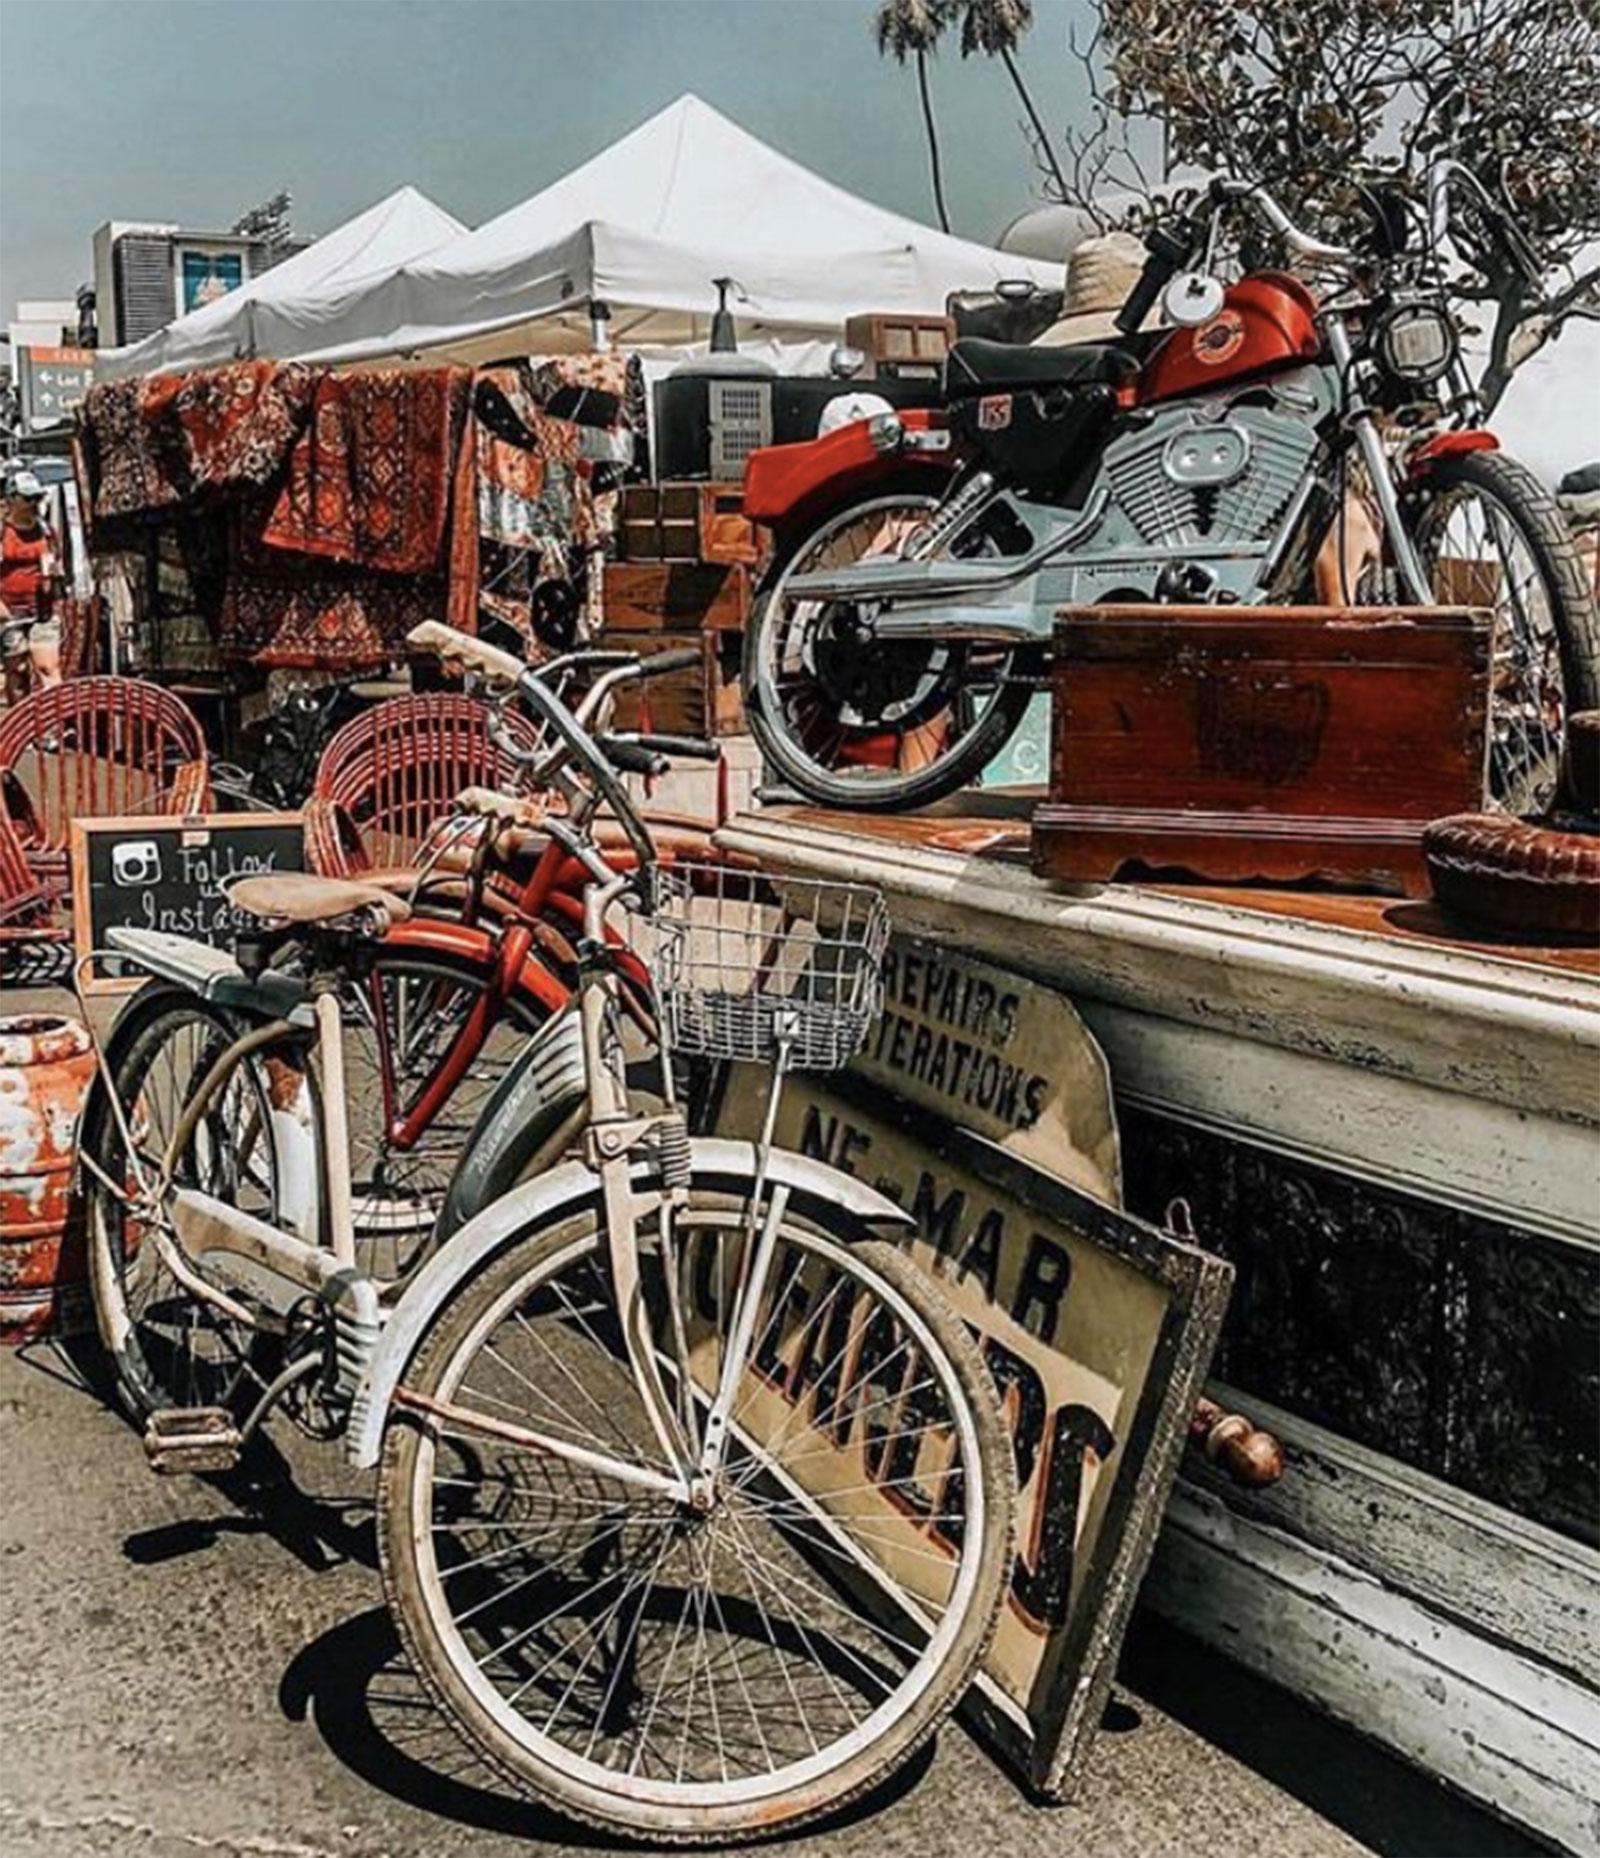 Rose_Bowl_Market_The_Ink_Collective_Pret-a-Partir_Los_Angeles_7.jpg